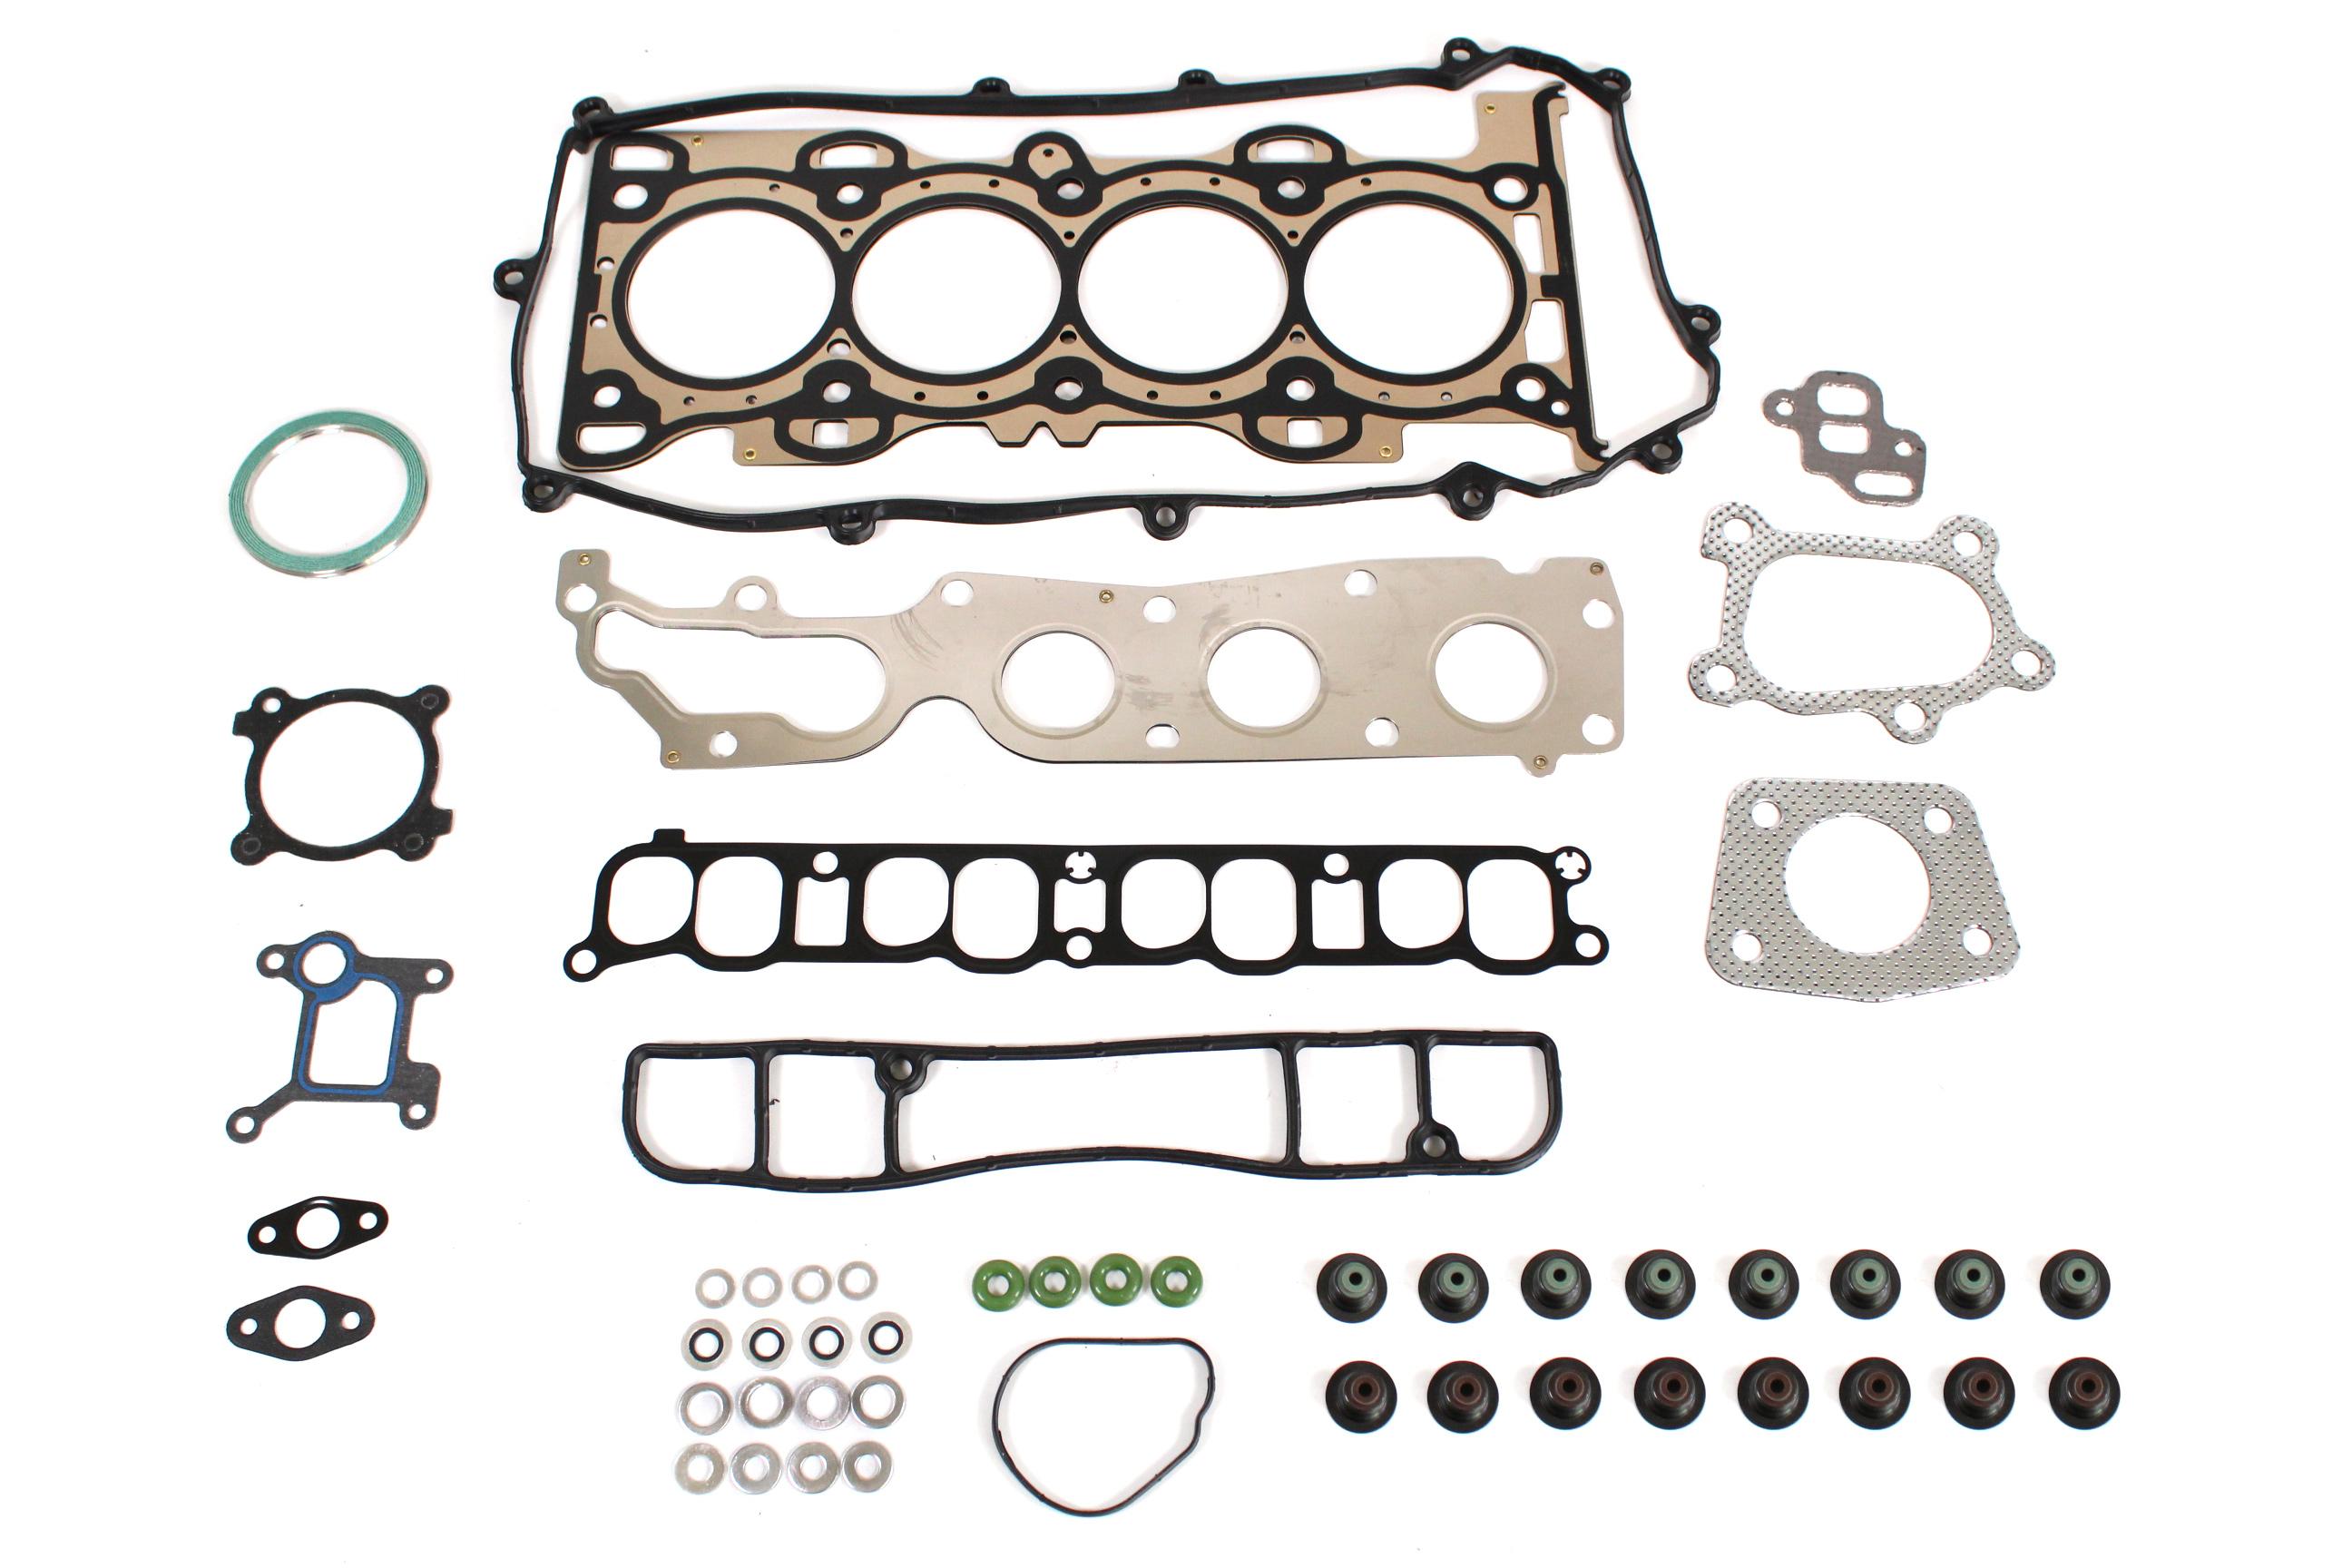 Dichtungssatz Dichtung Mazda CX-7 2,3 MZR Turbo L3-VDT 8LL6-10-271 NEU